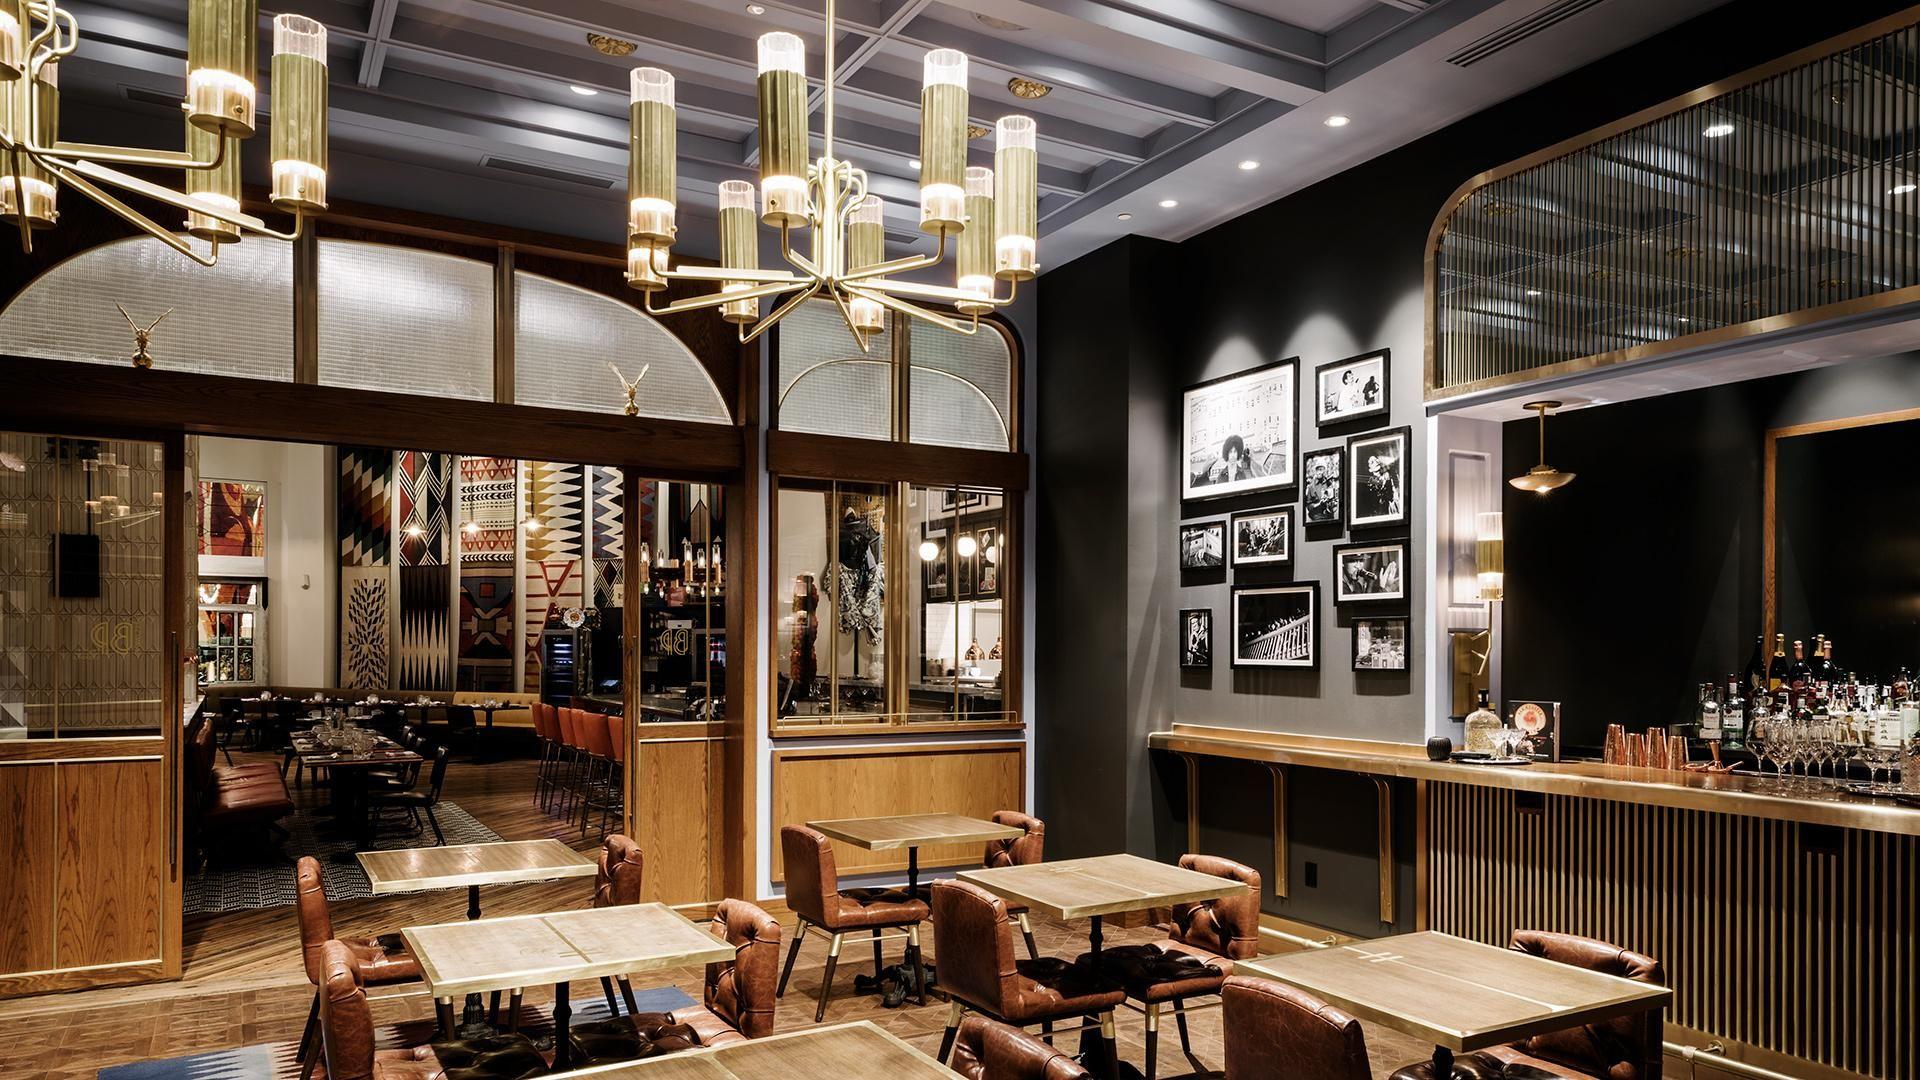 Best Restaurant Interior Design Trends For 2017 Com Imagens